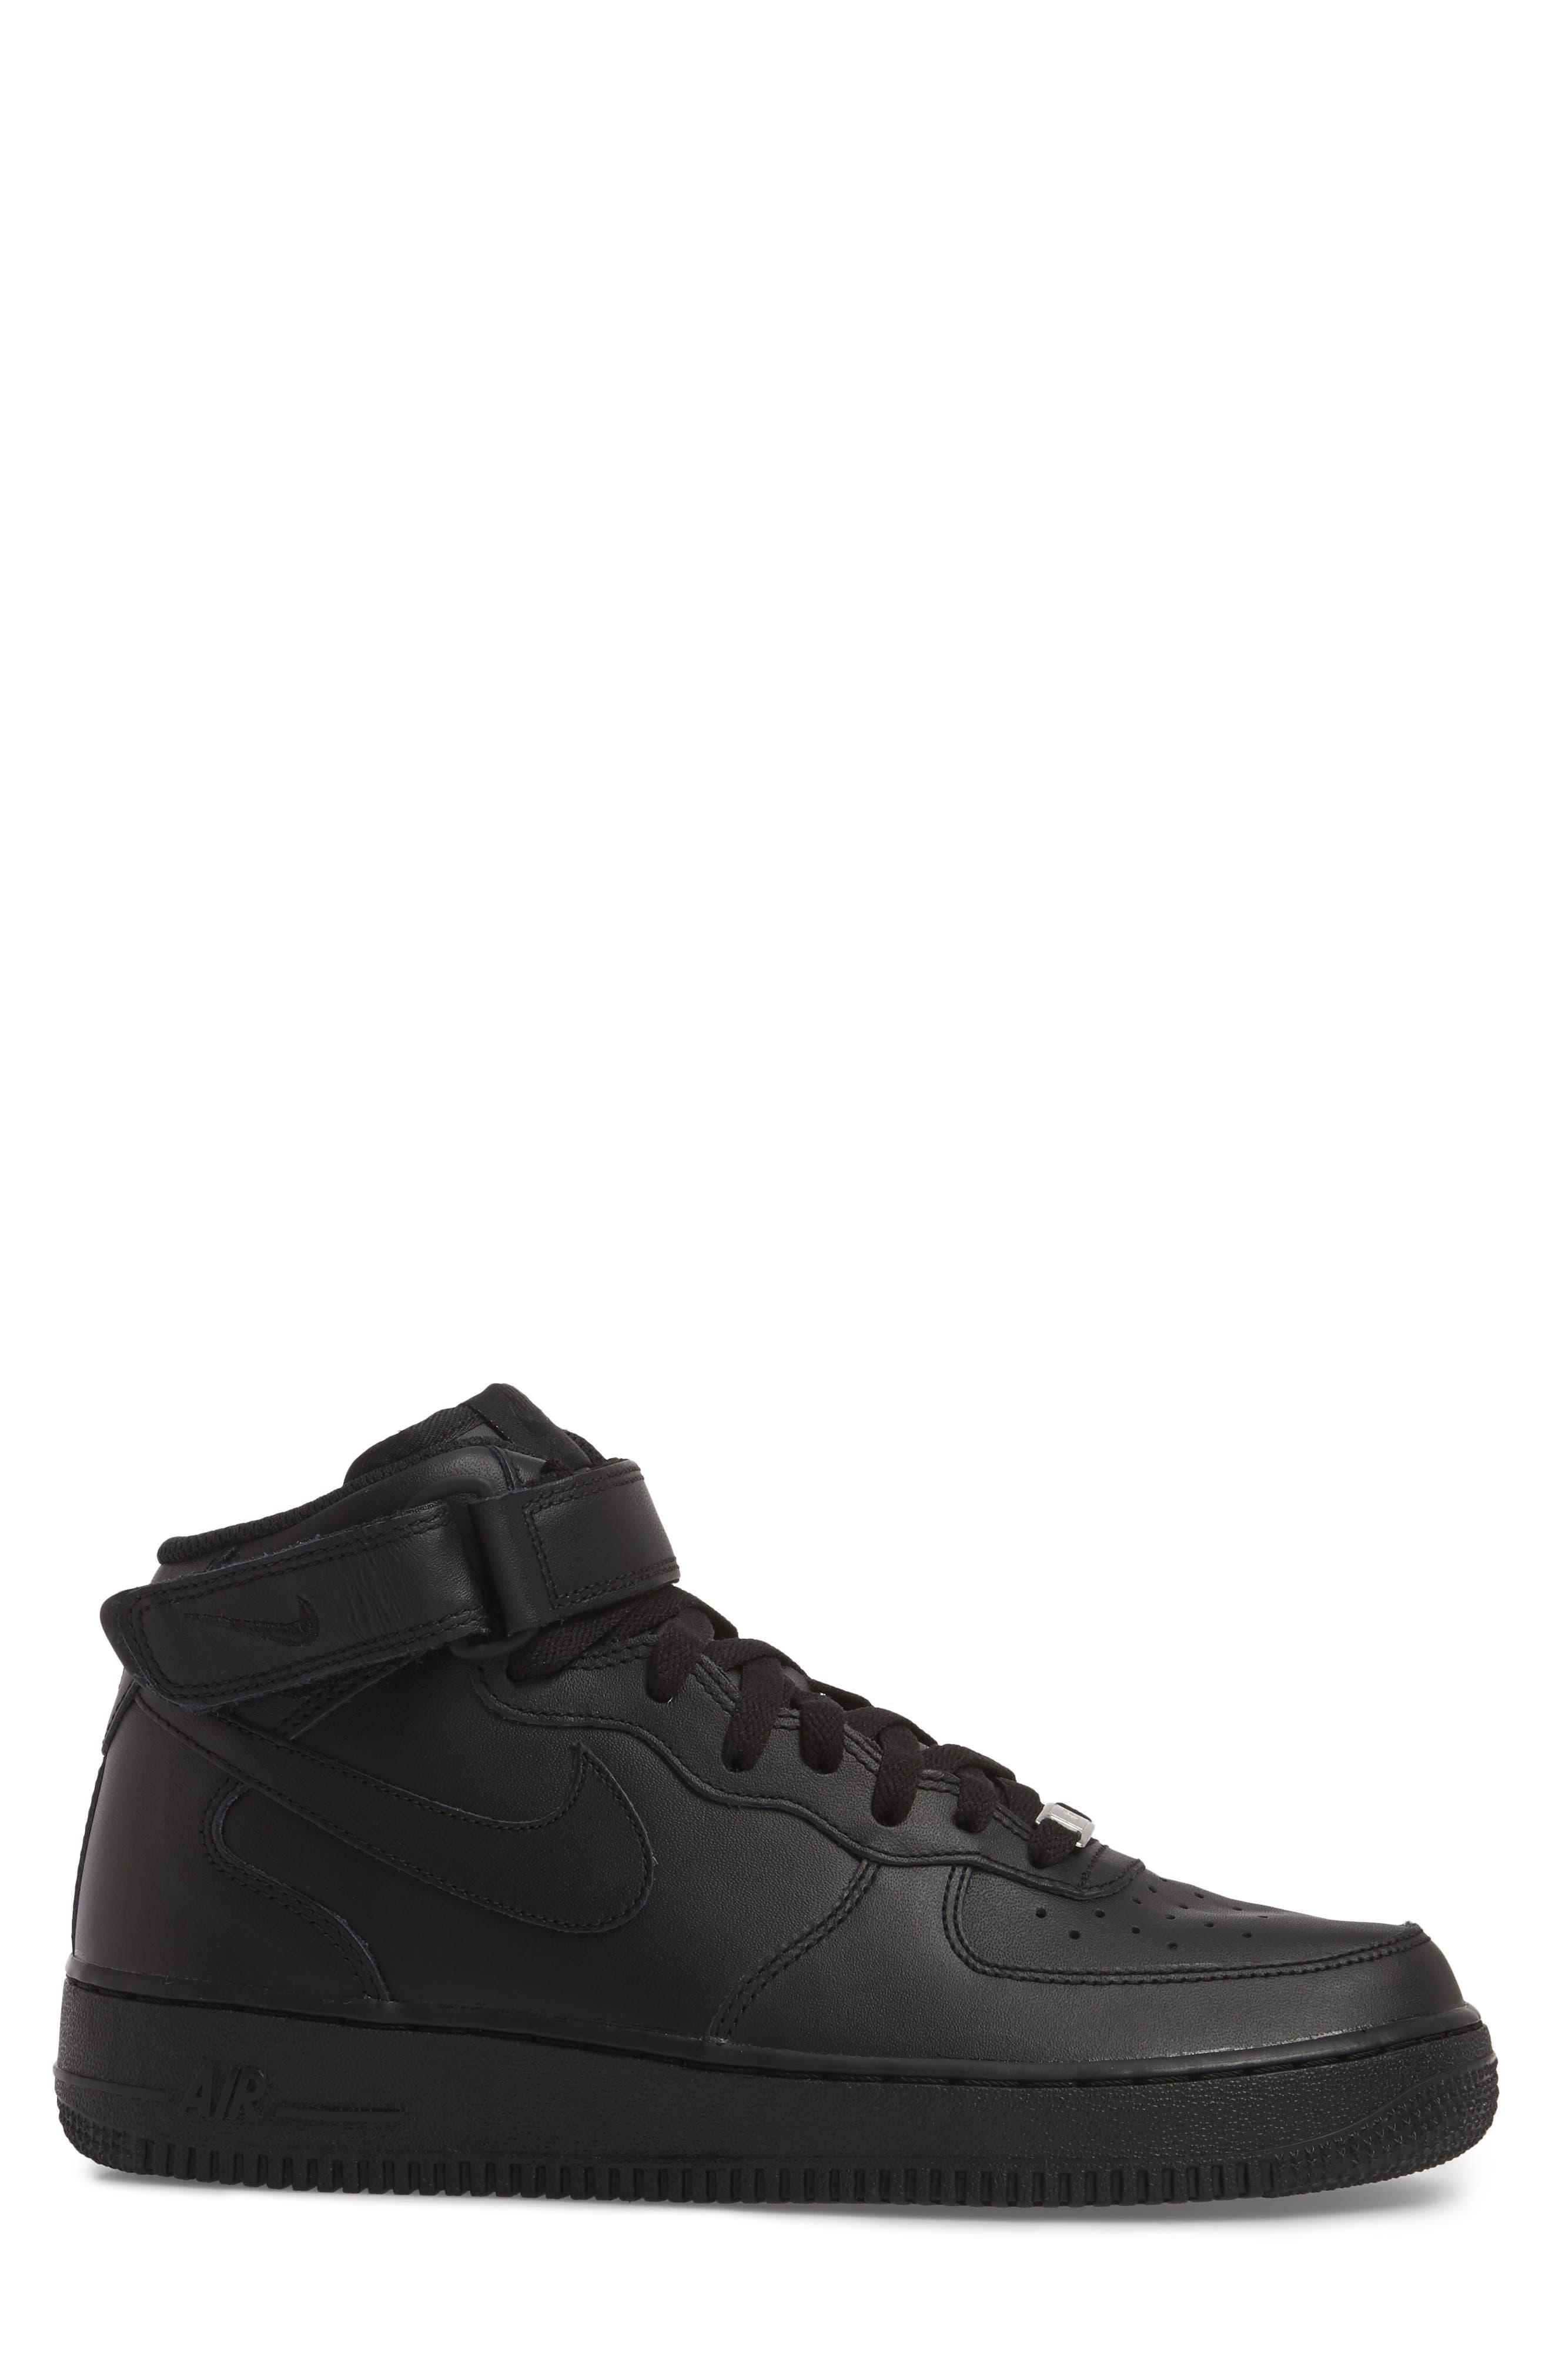 NIKE, Air Force 1 Mid '07 Sneaker, Alternate thumbnail 3, color, BLACK/ BLACK